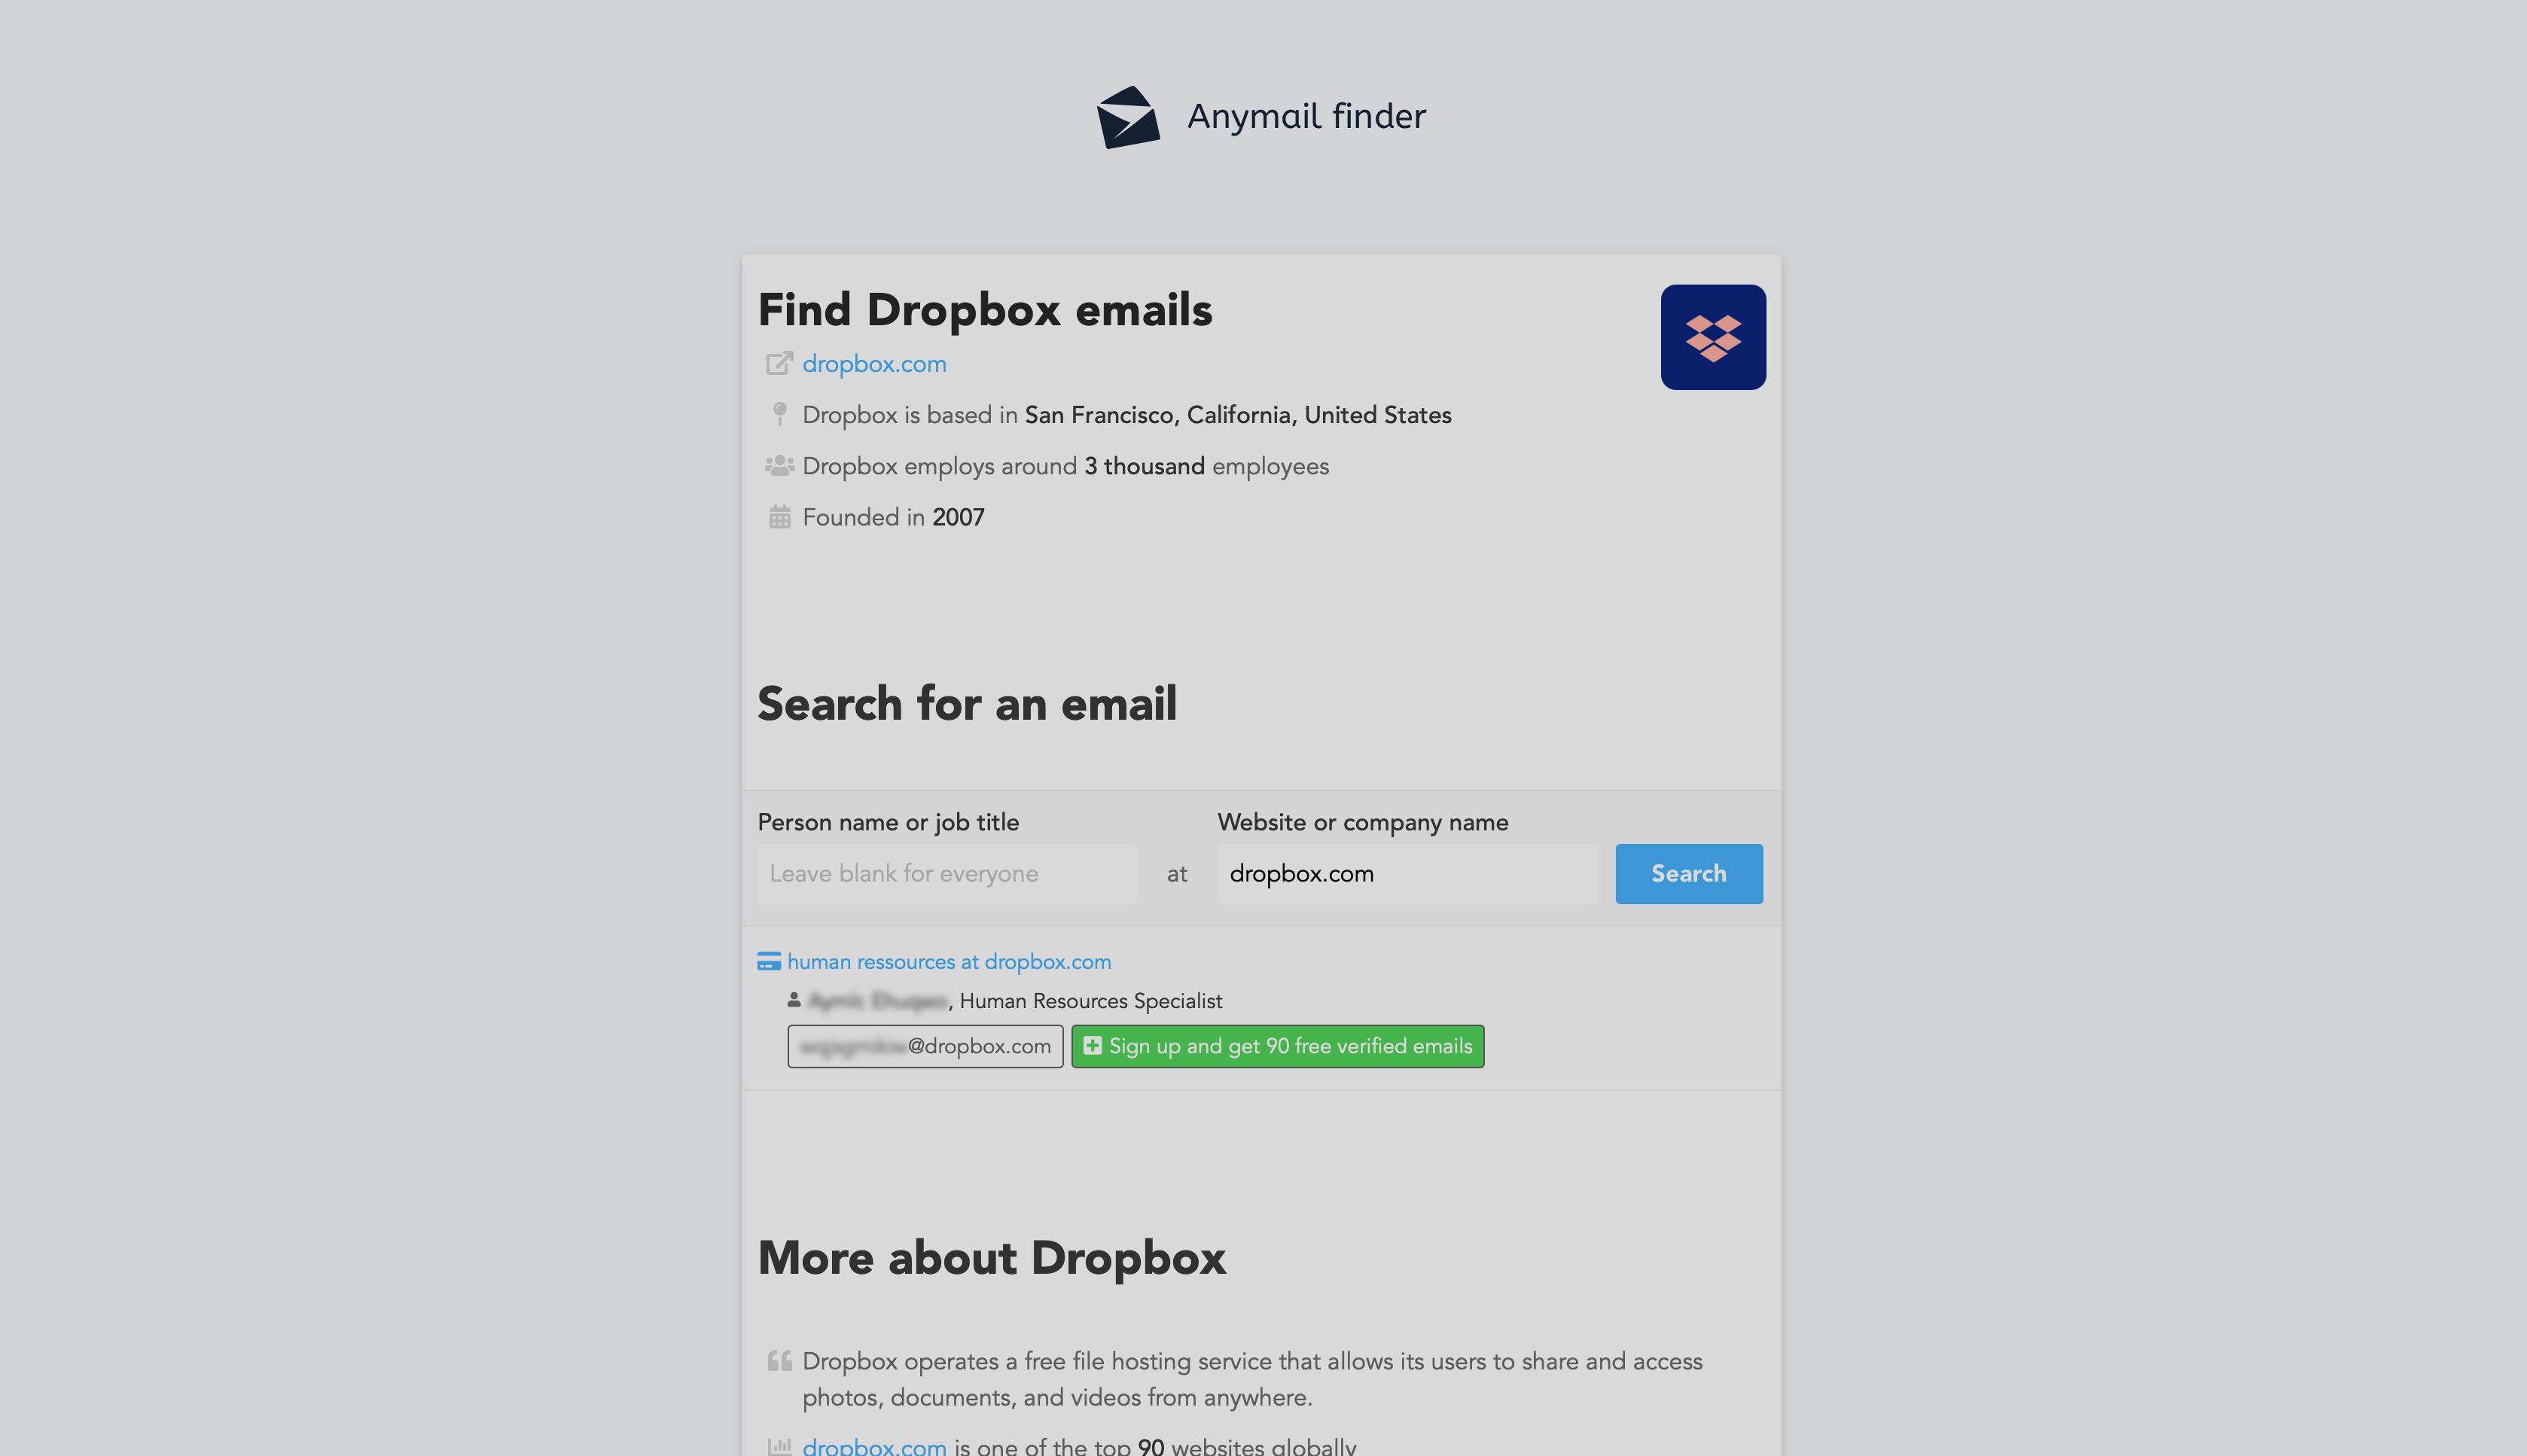 Top Meilleur email finder : Anymail Finder